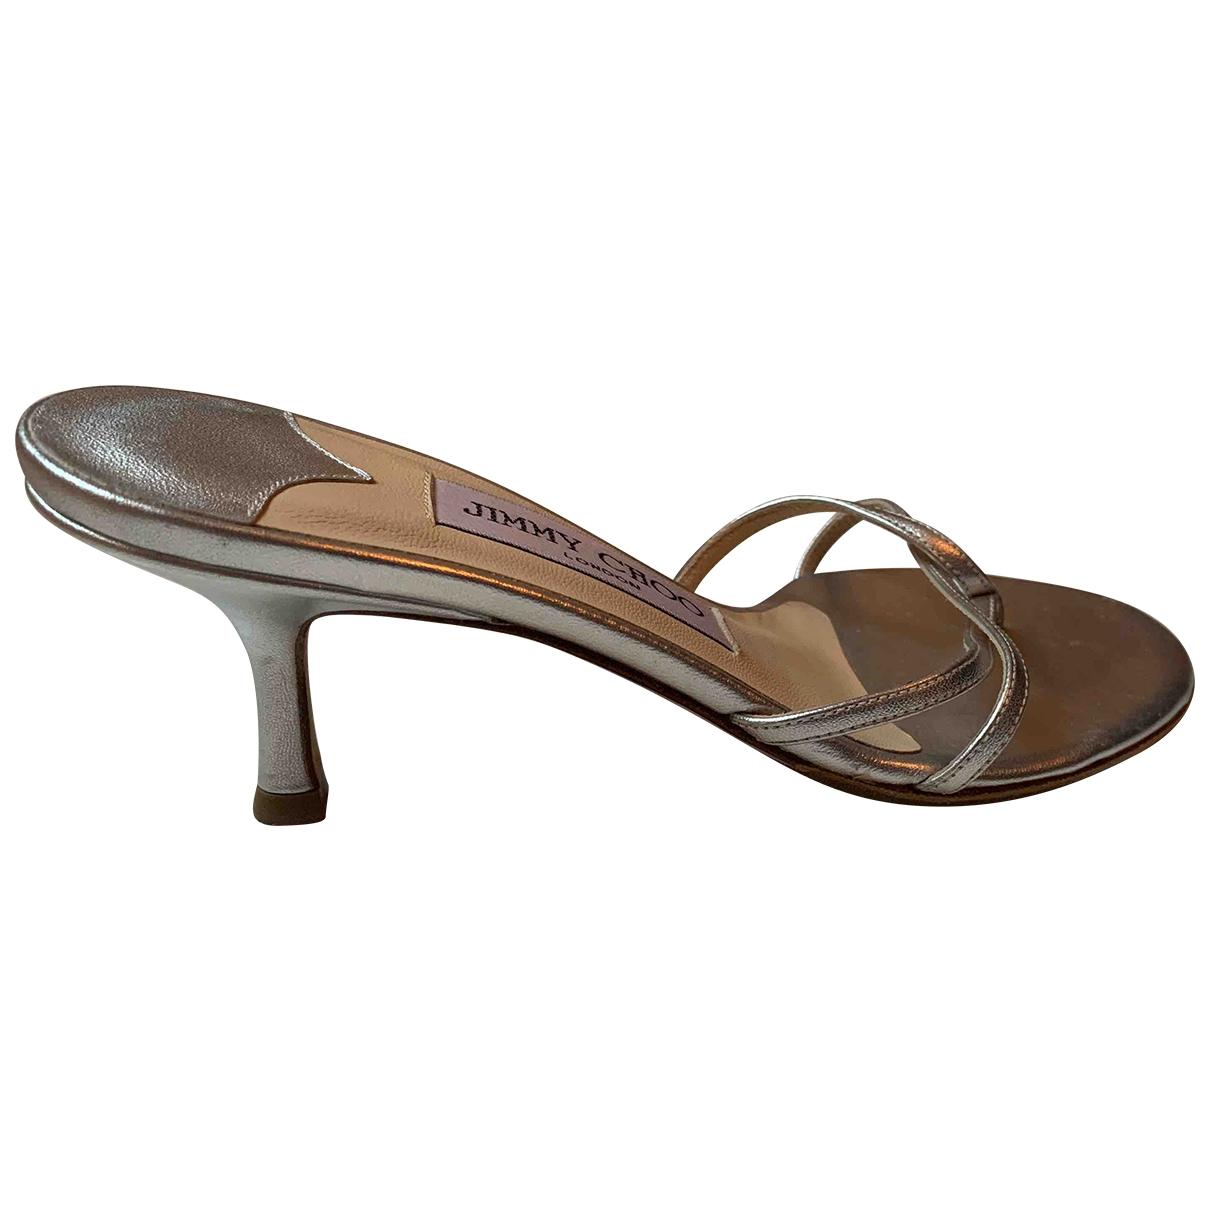 Jimmy Choo \N Silver Leather Sandals for Women 35 IT